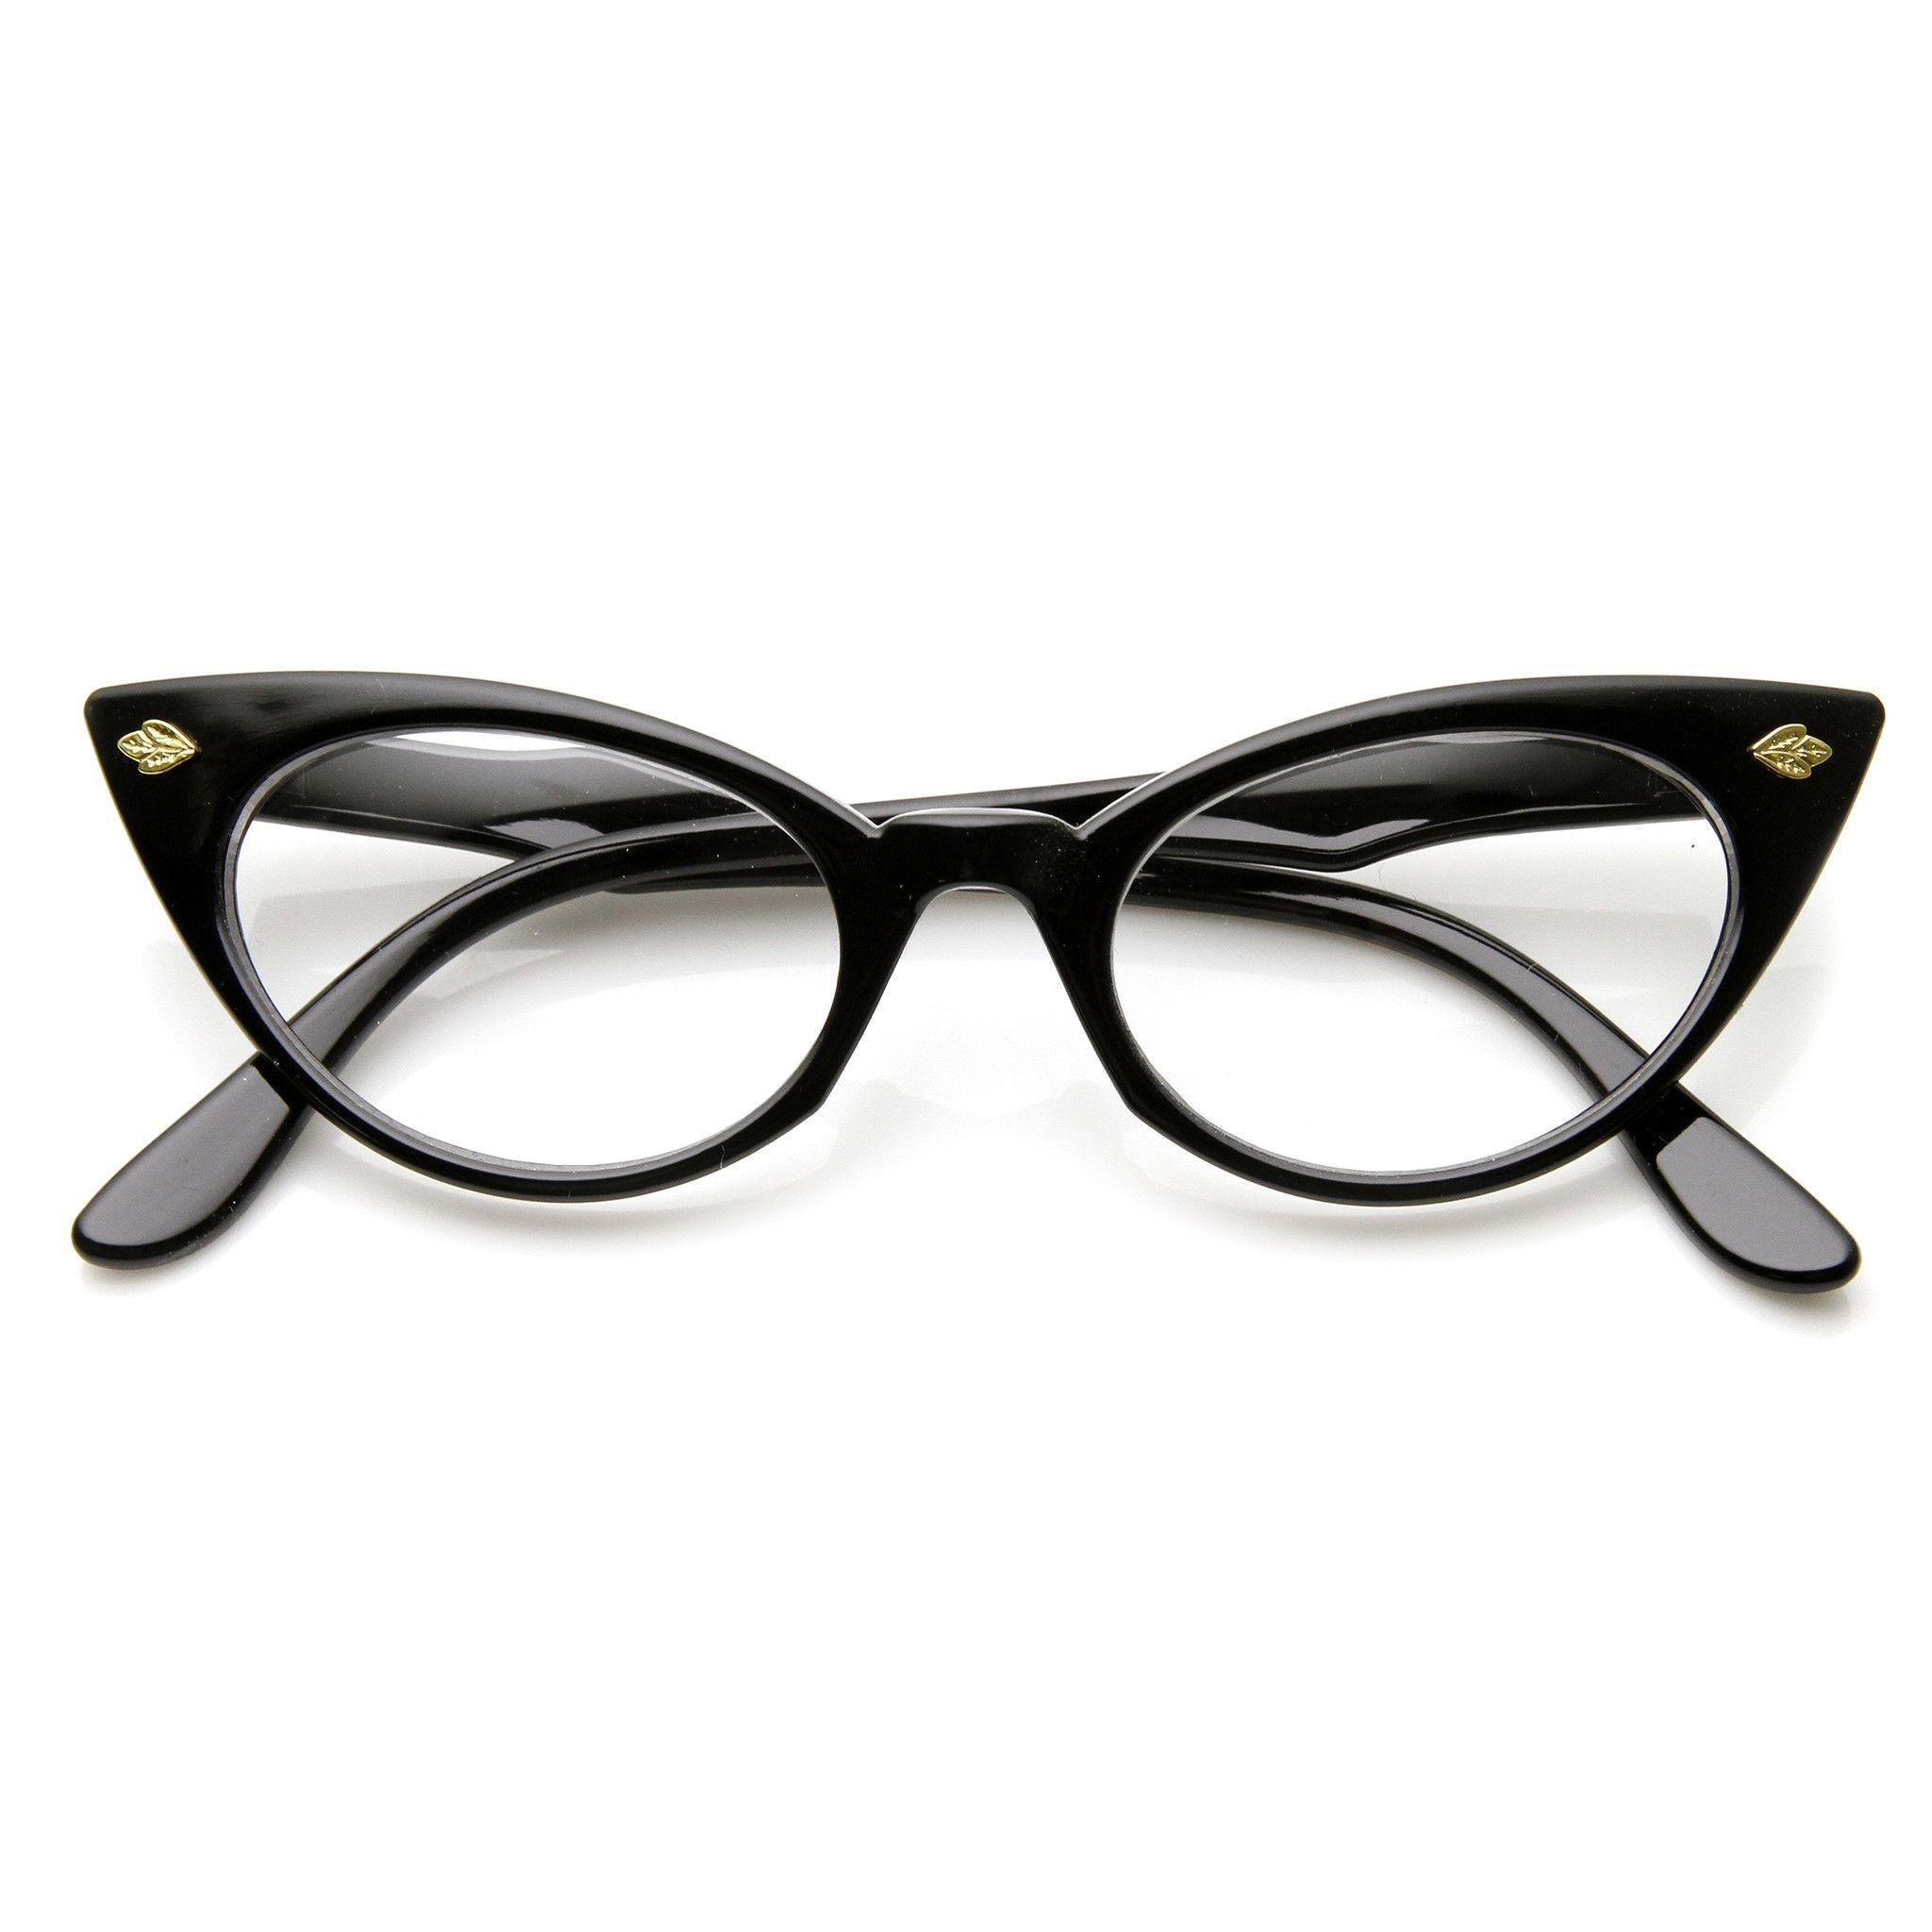 Kinglly Retro Vintage Cateye Sunglasses for Women Plastic Mirrored Frame Lens